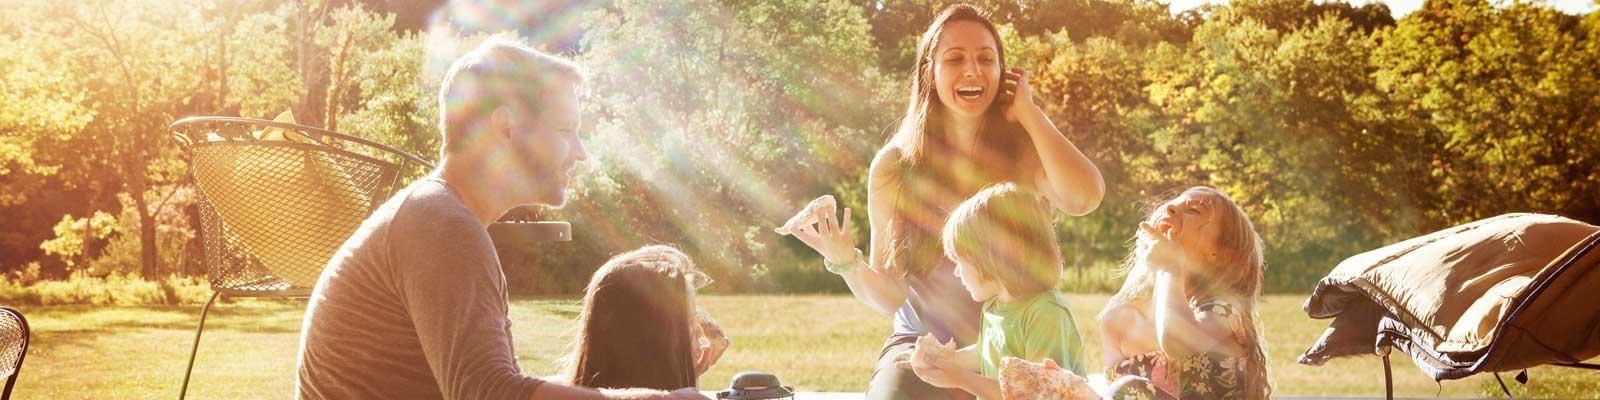 vacances d'été /be-nl/1600x400/1600x400_VN120975.jpg